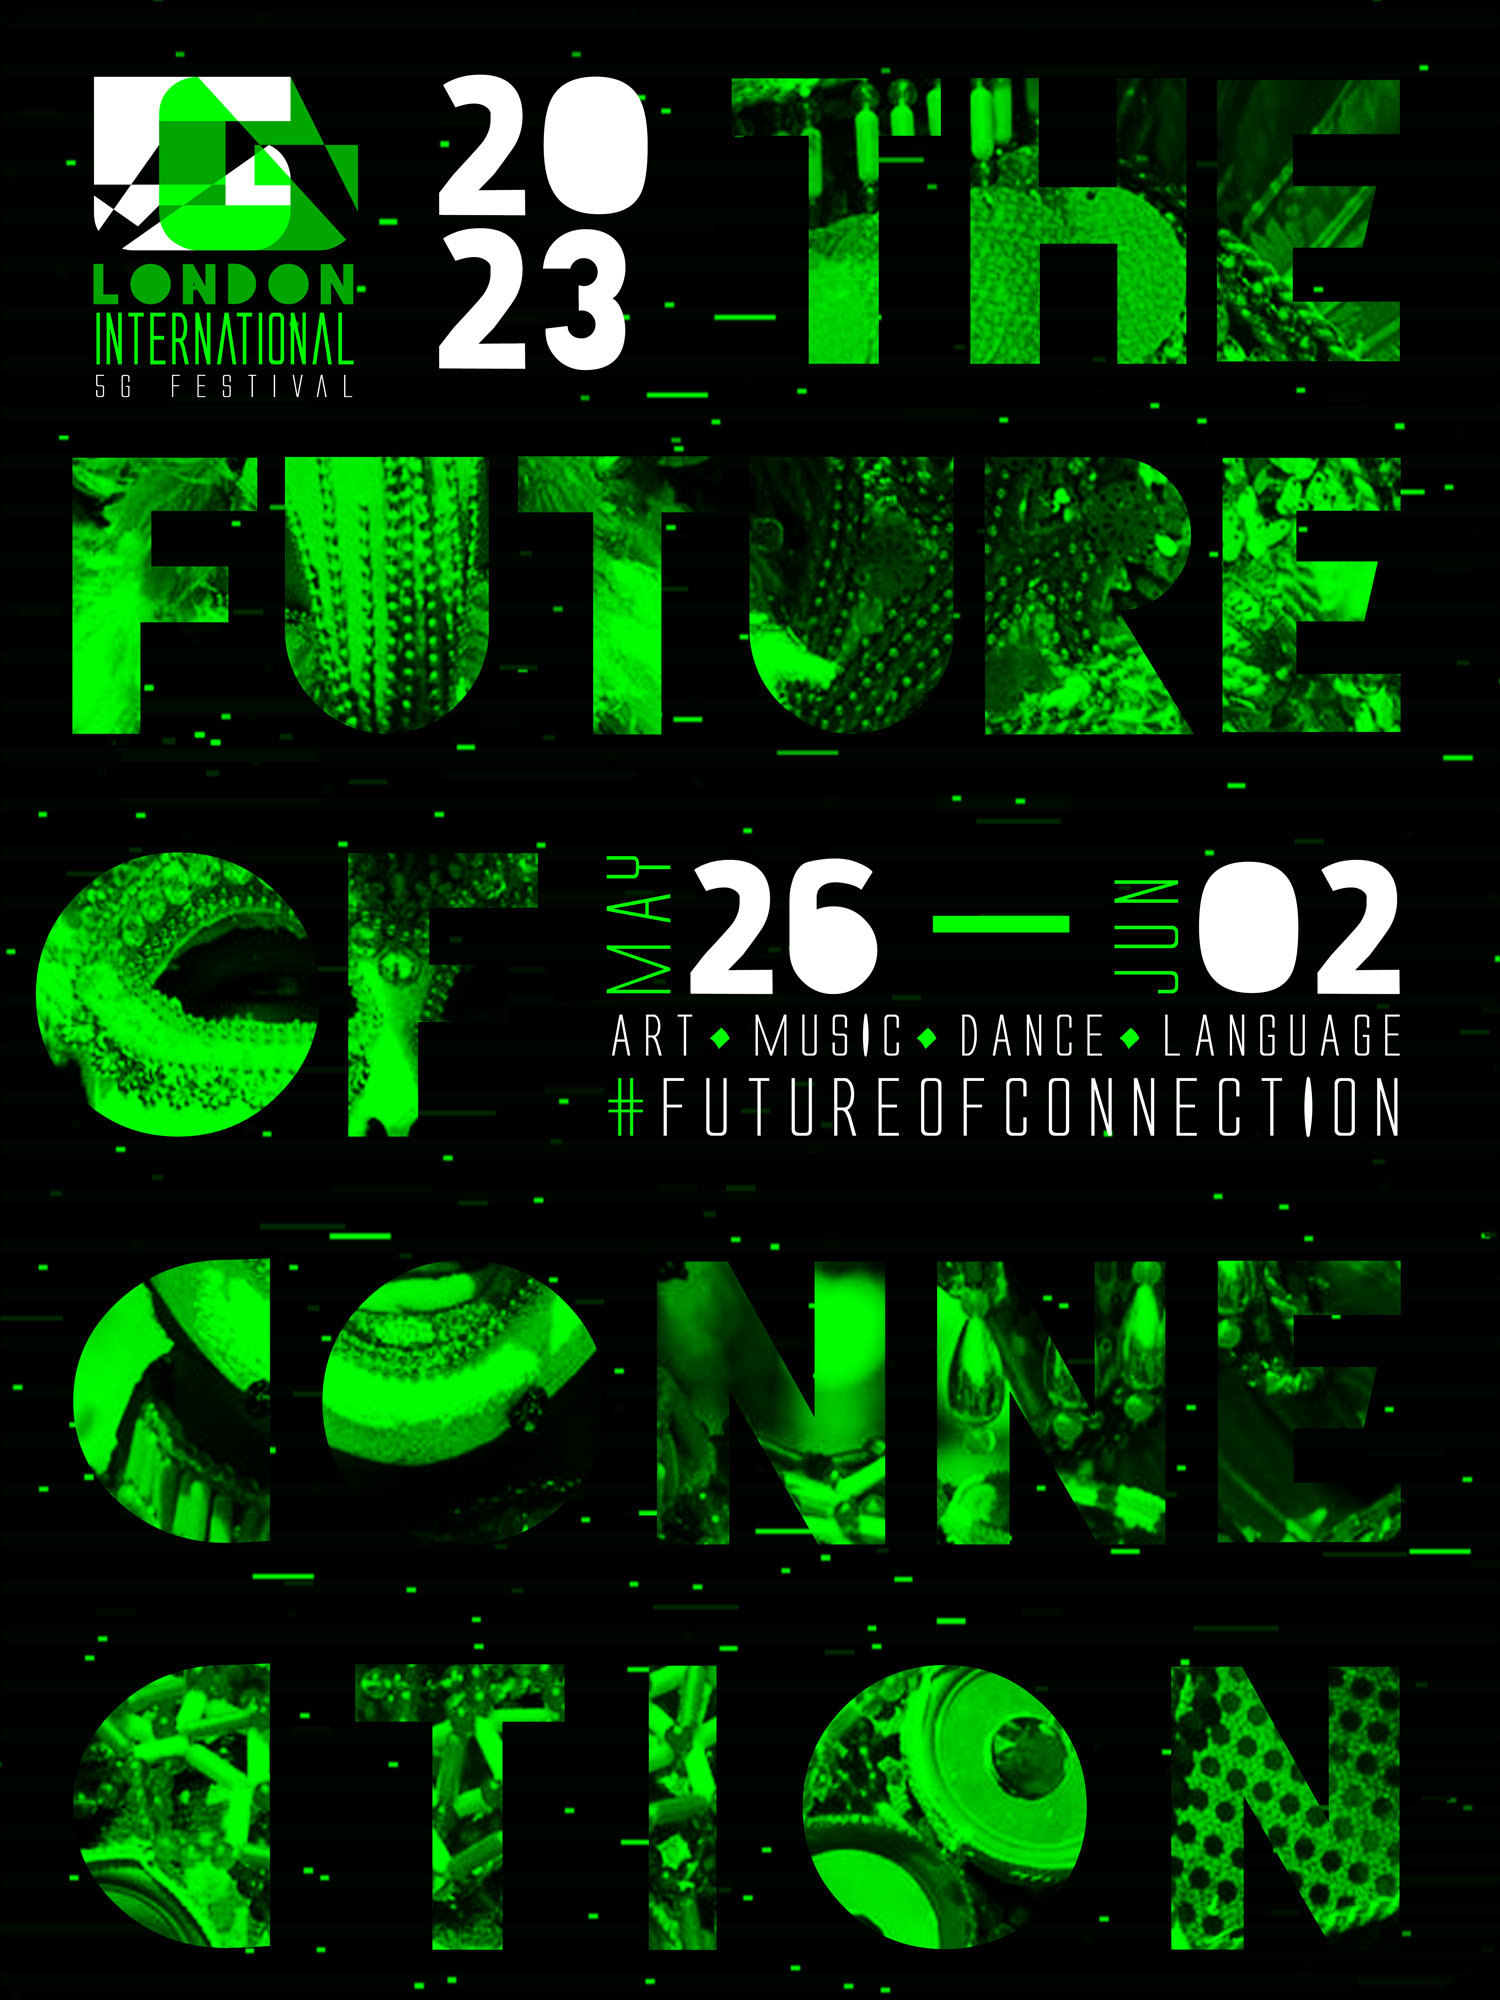 Kligerman-5G-Fest-Poster-Green1